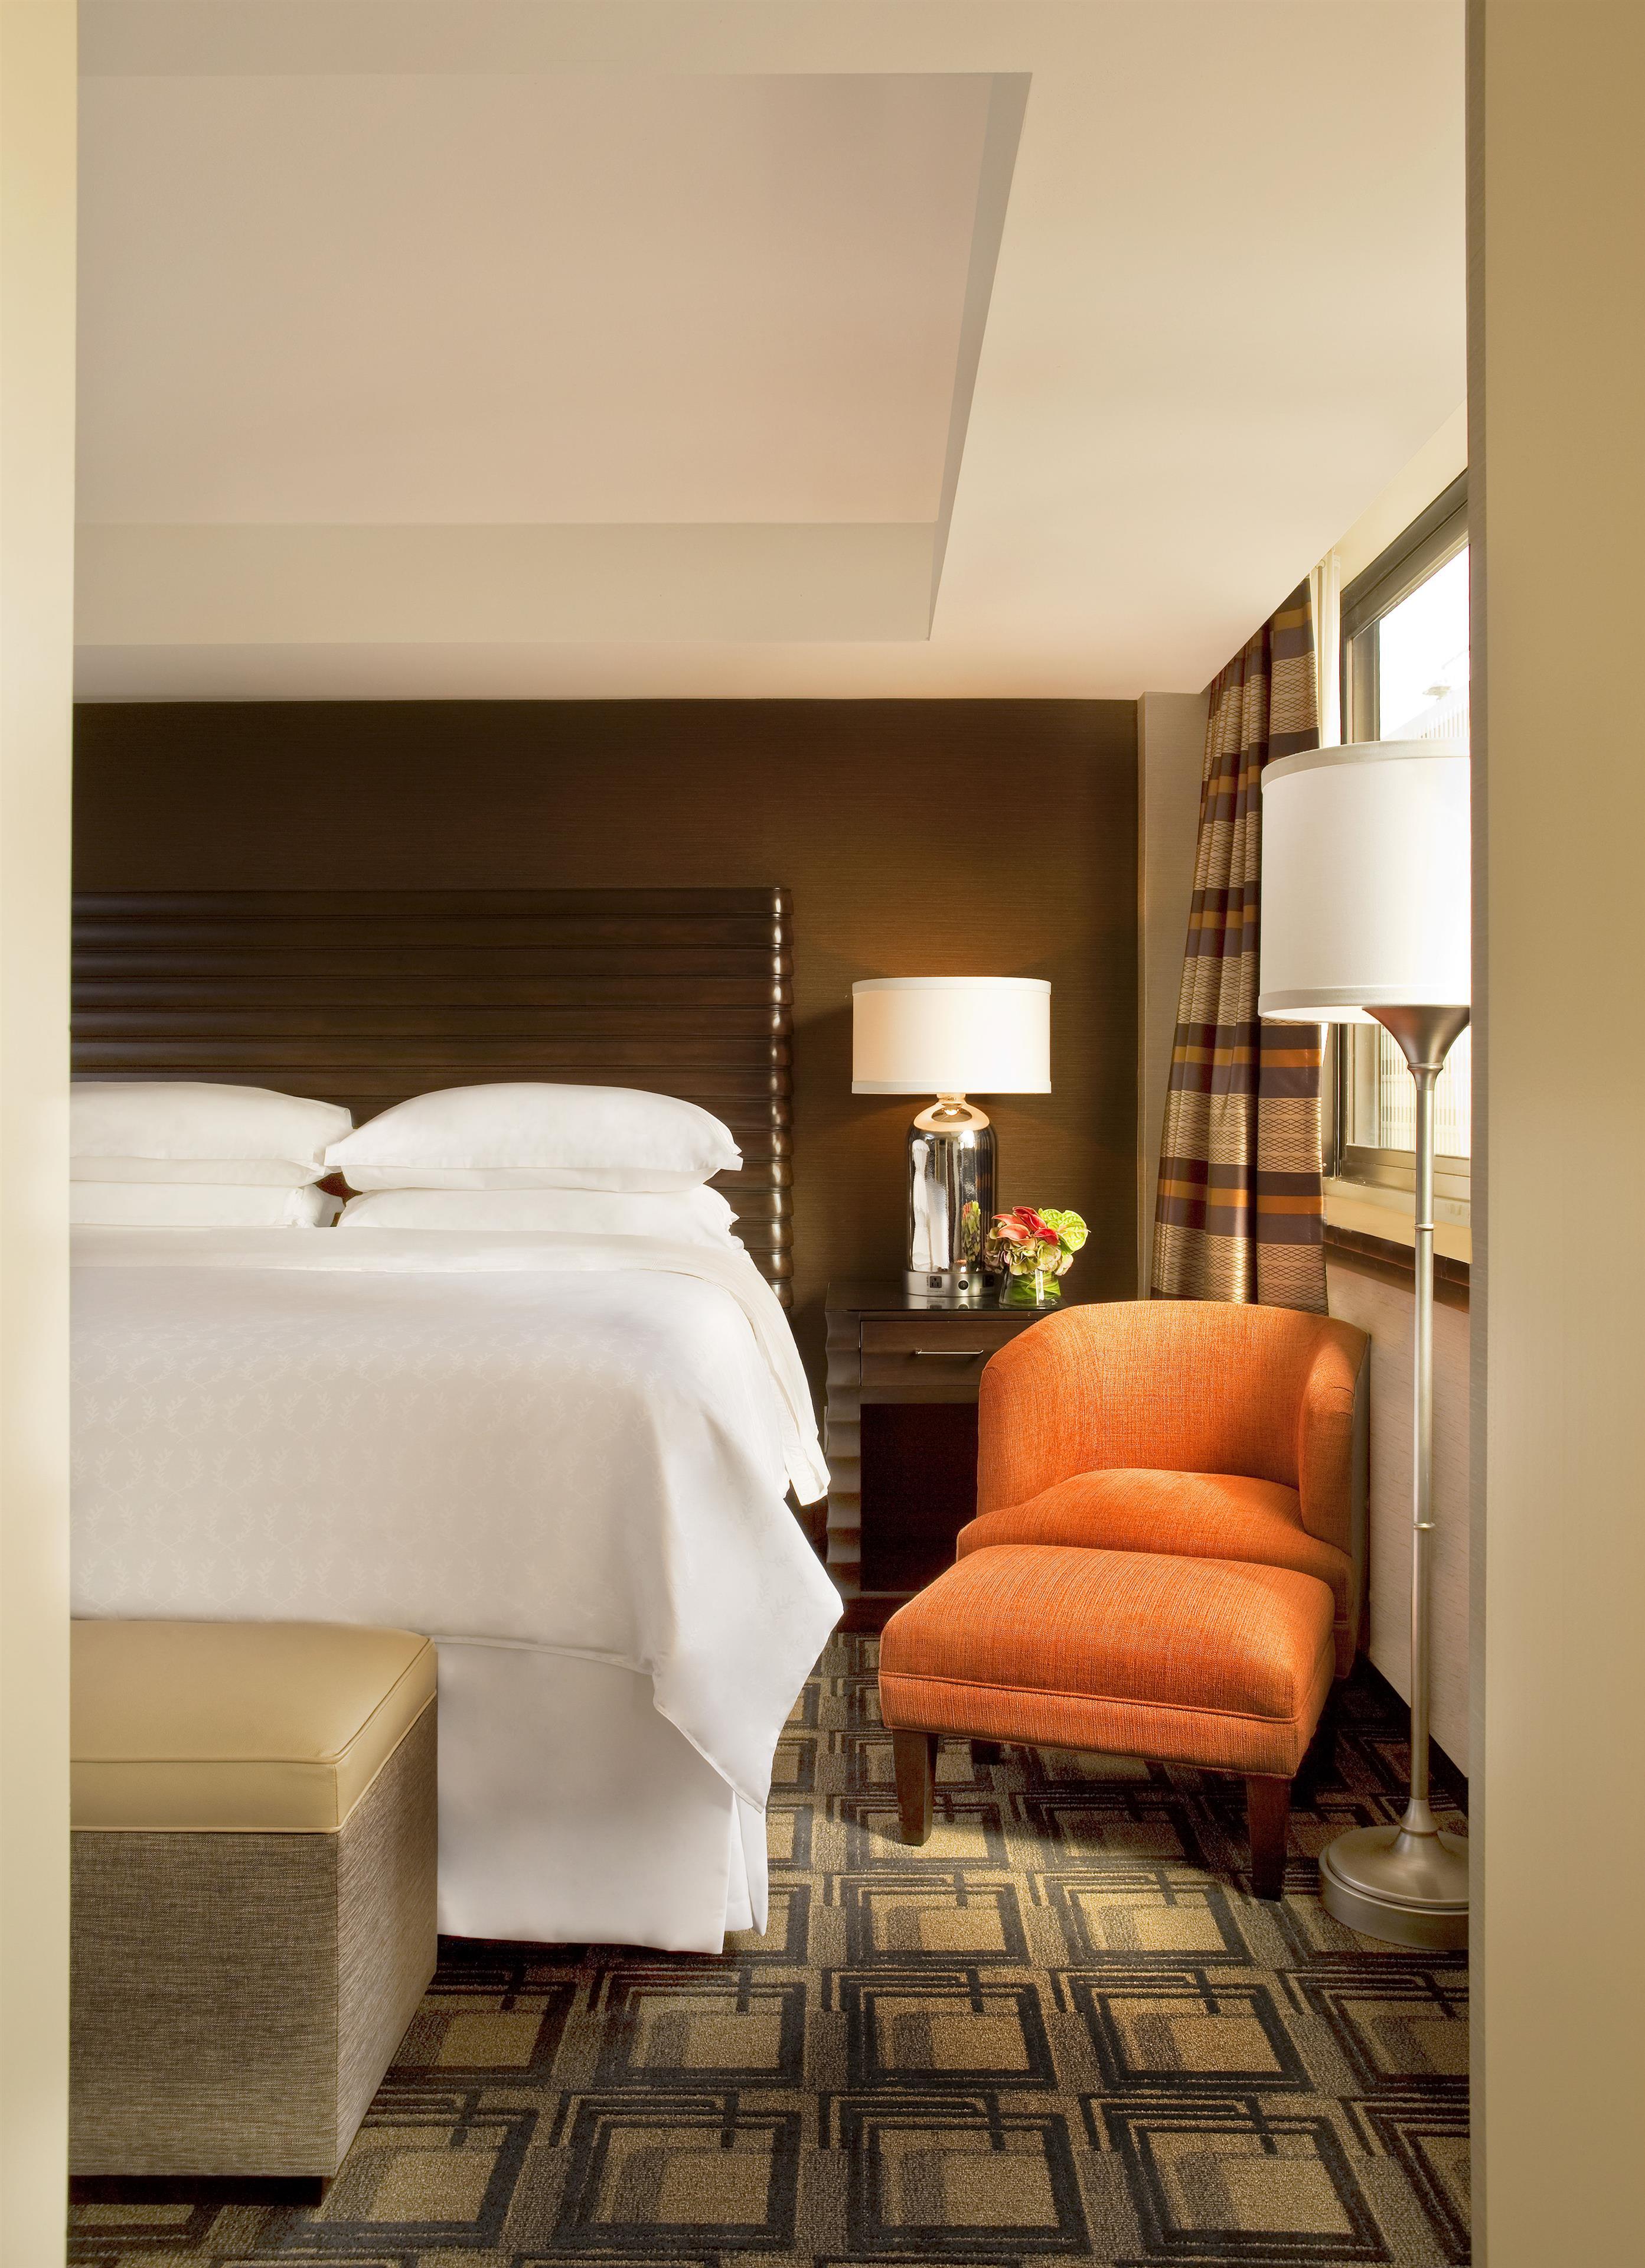 Sheraton New York Times Square Hotel image 11